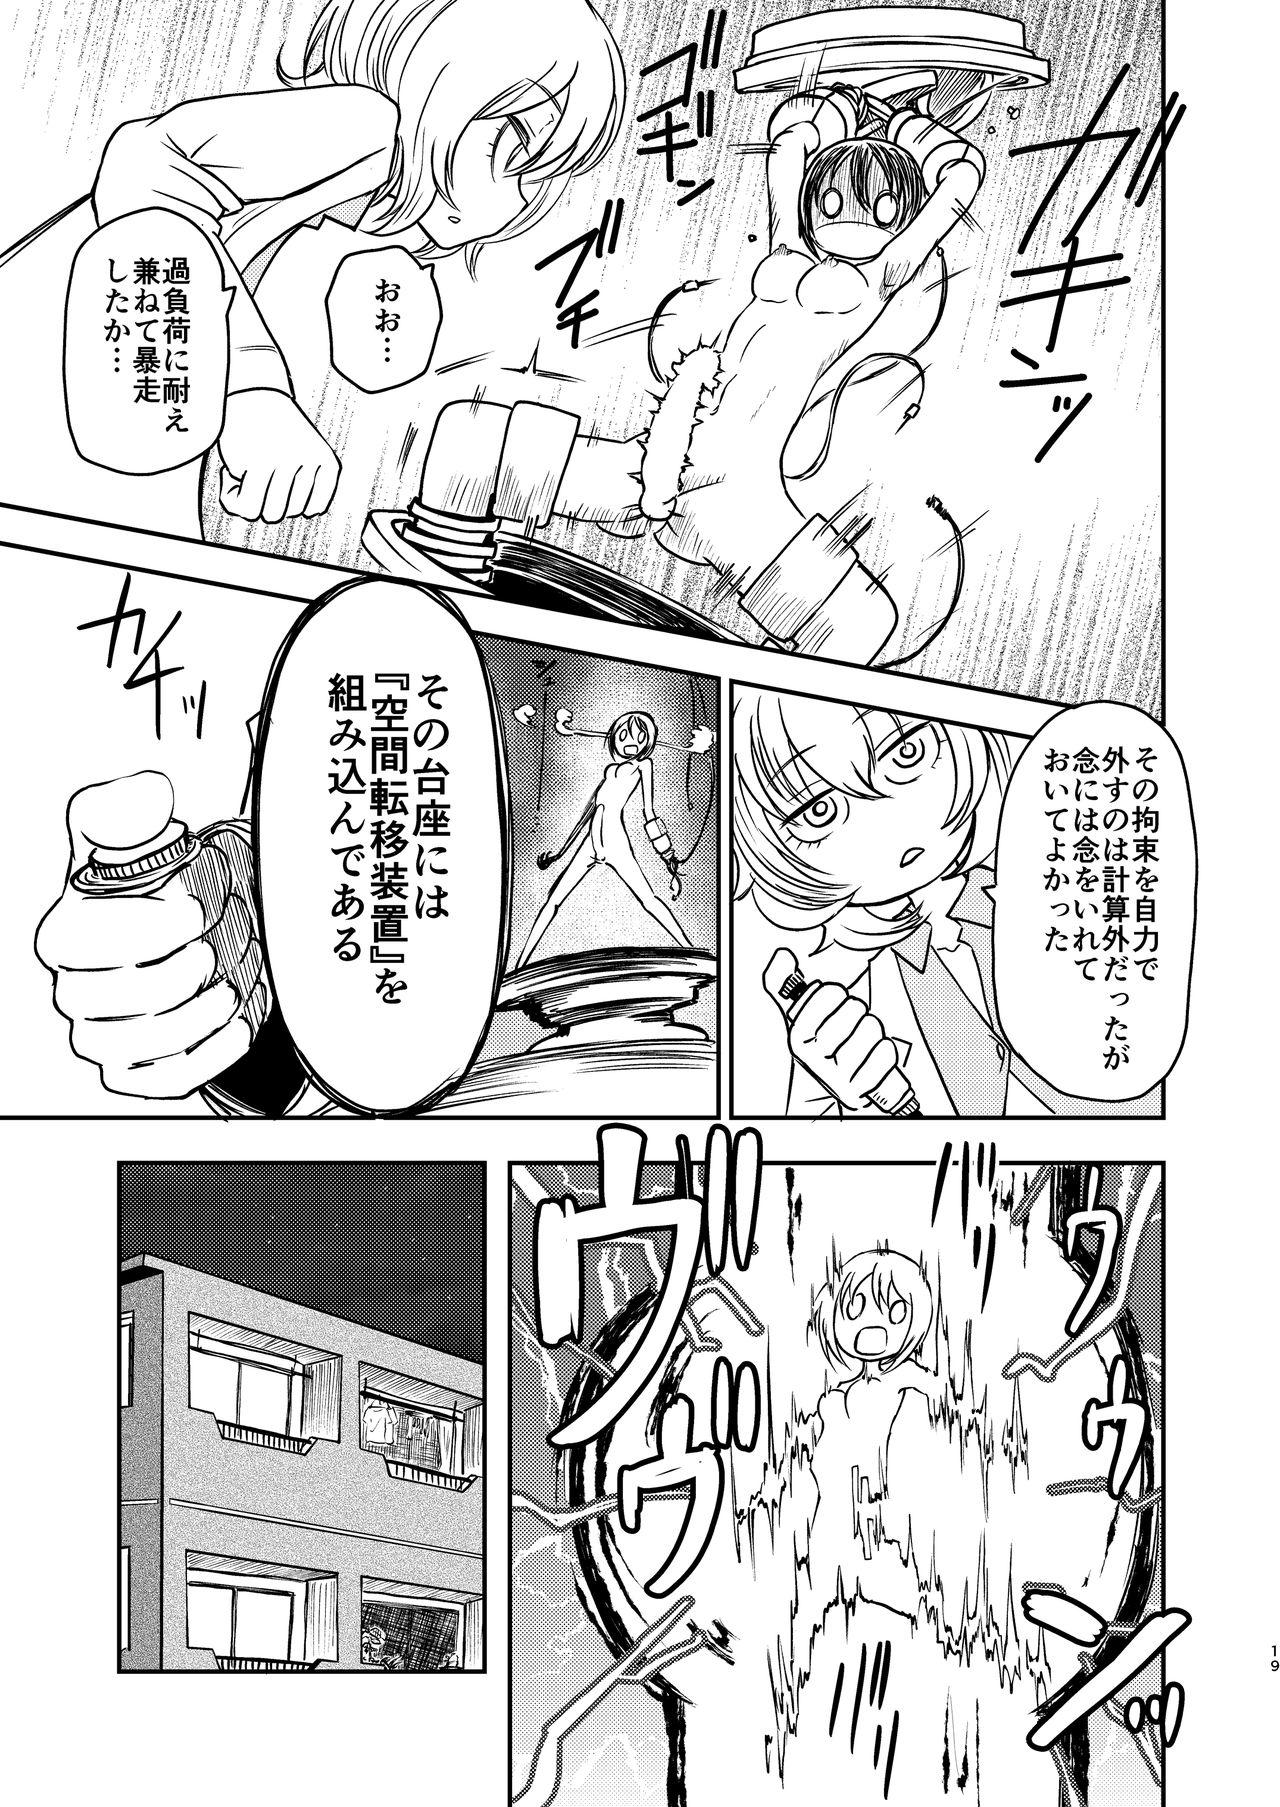 Ponkotsu Futa Robot Laboratory Σ 18